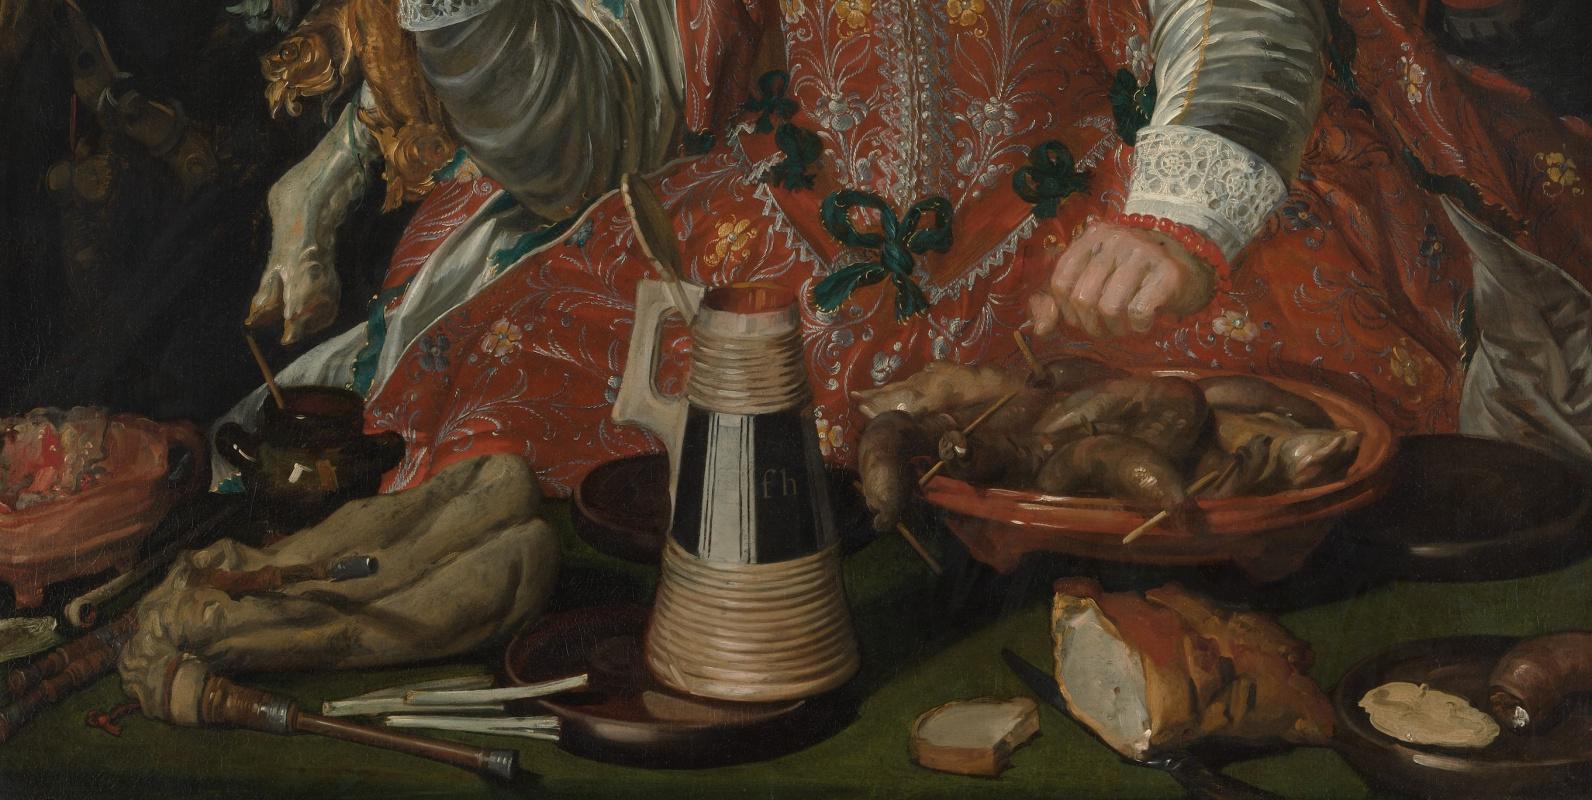 Frans Hals. Jolly Shrovetide (Merry Society). Fragment 4. Table